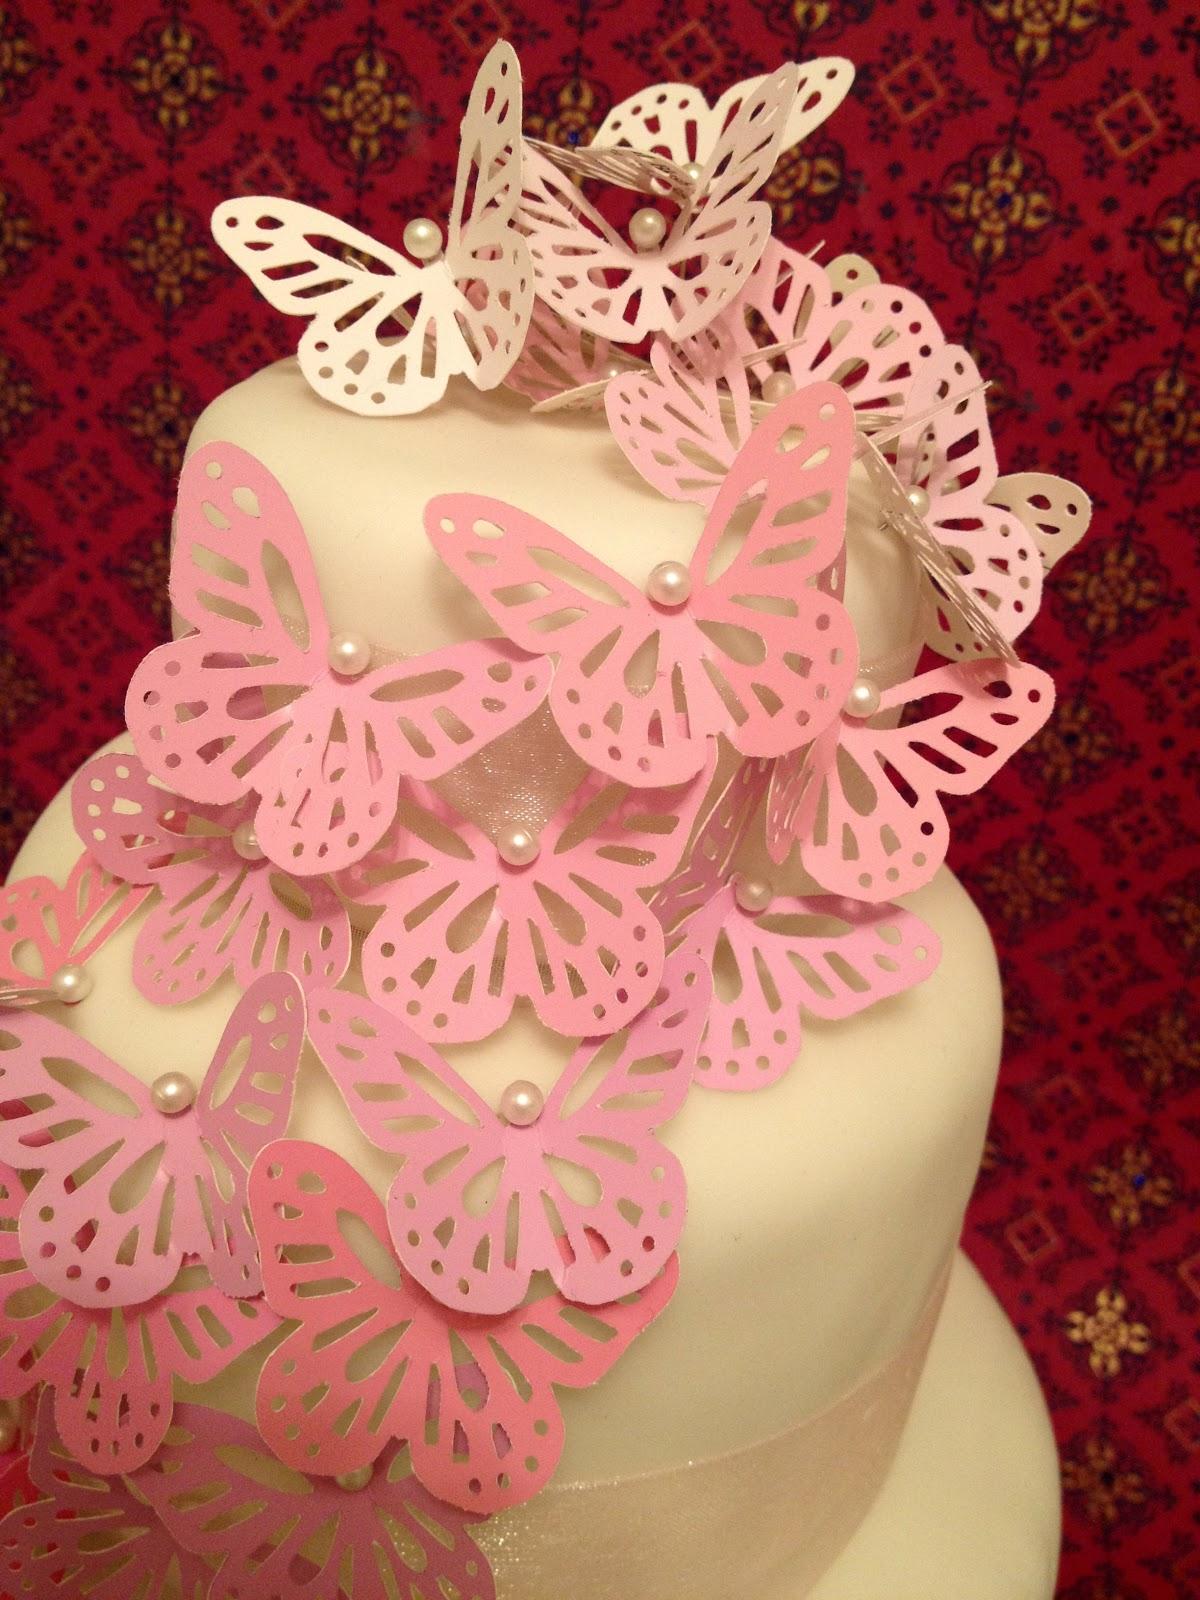 8 birthday cakes to make yourself photo easy do it yourself easy to make yourself wedding cakes solutioingenieria Choice Image